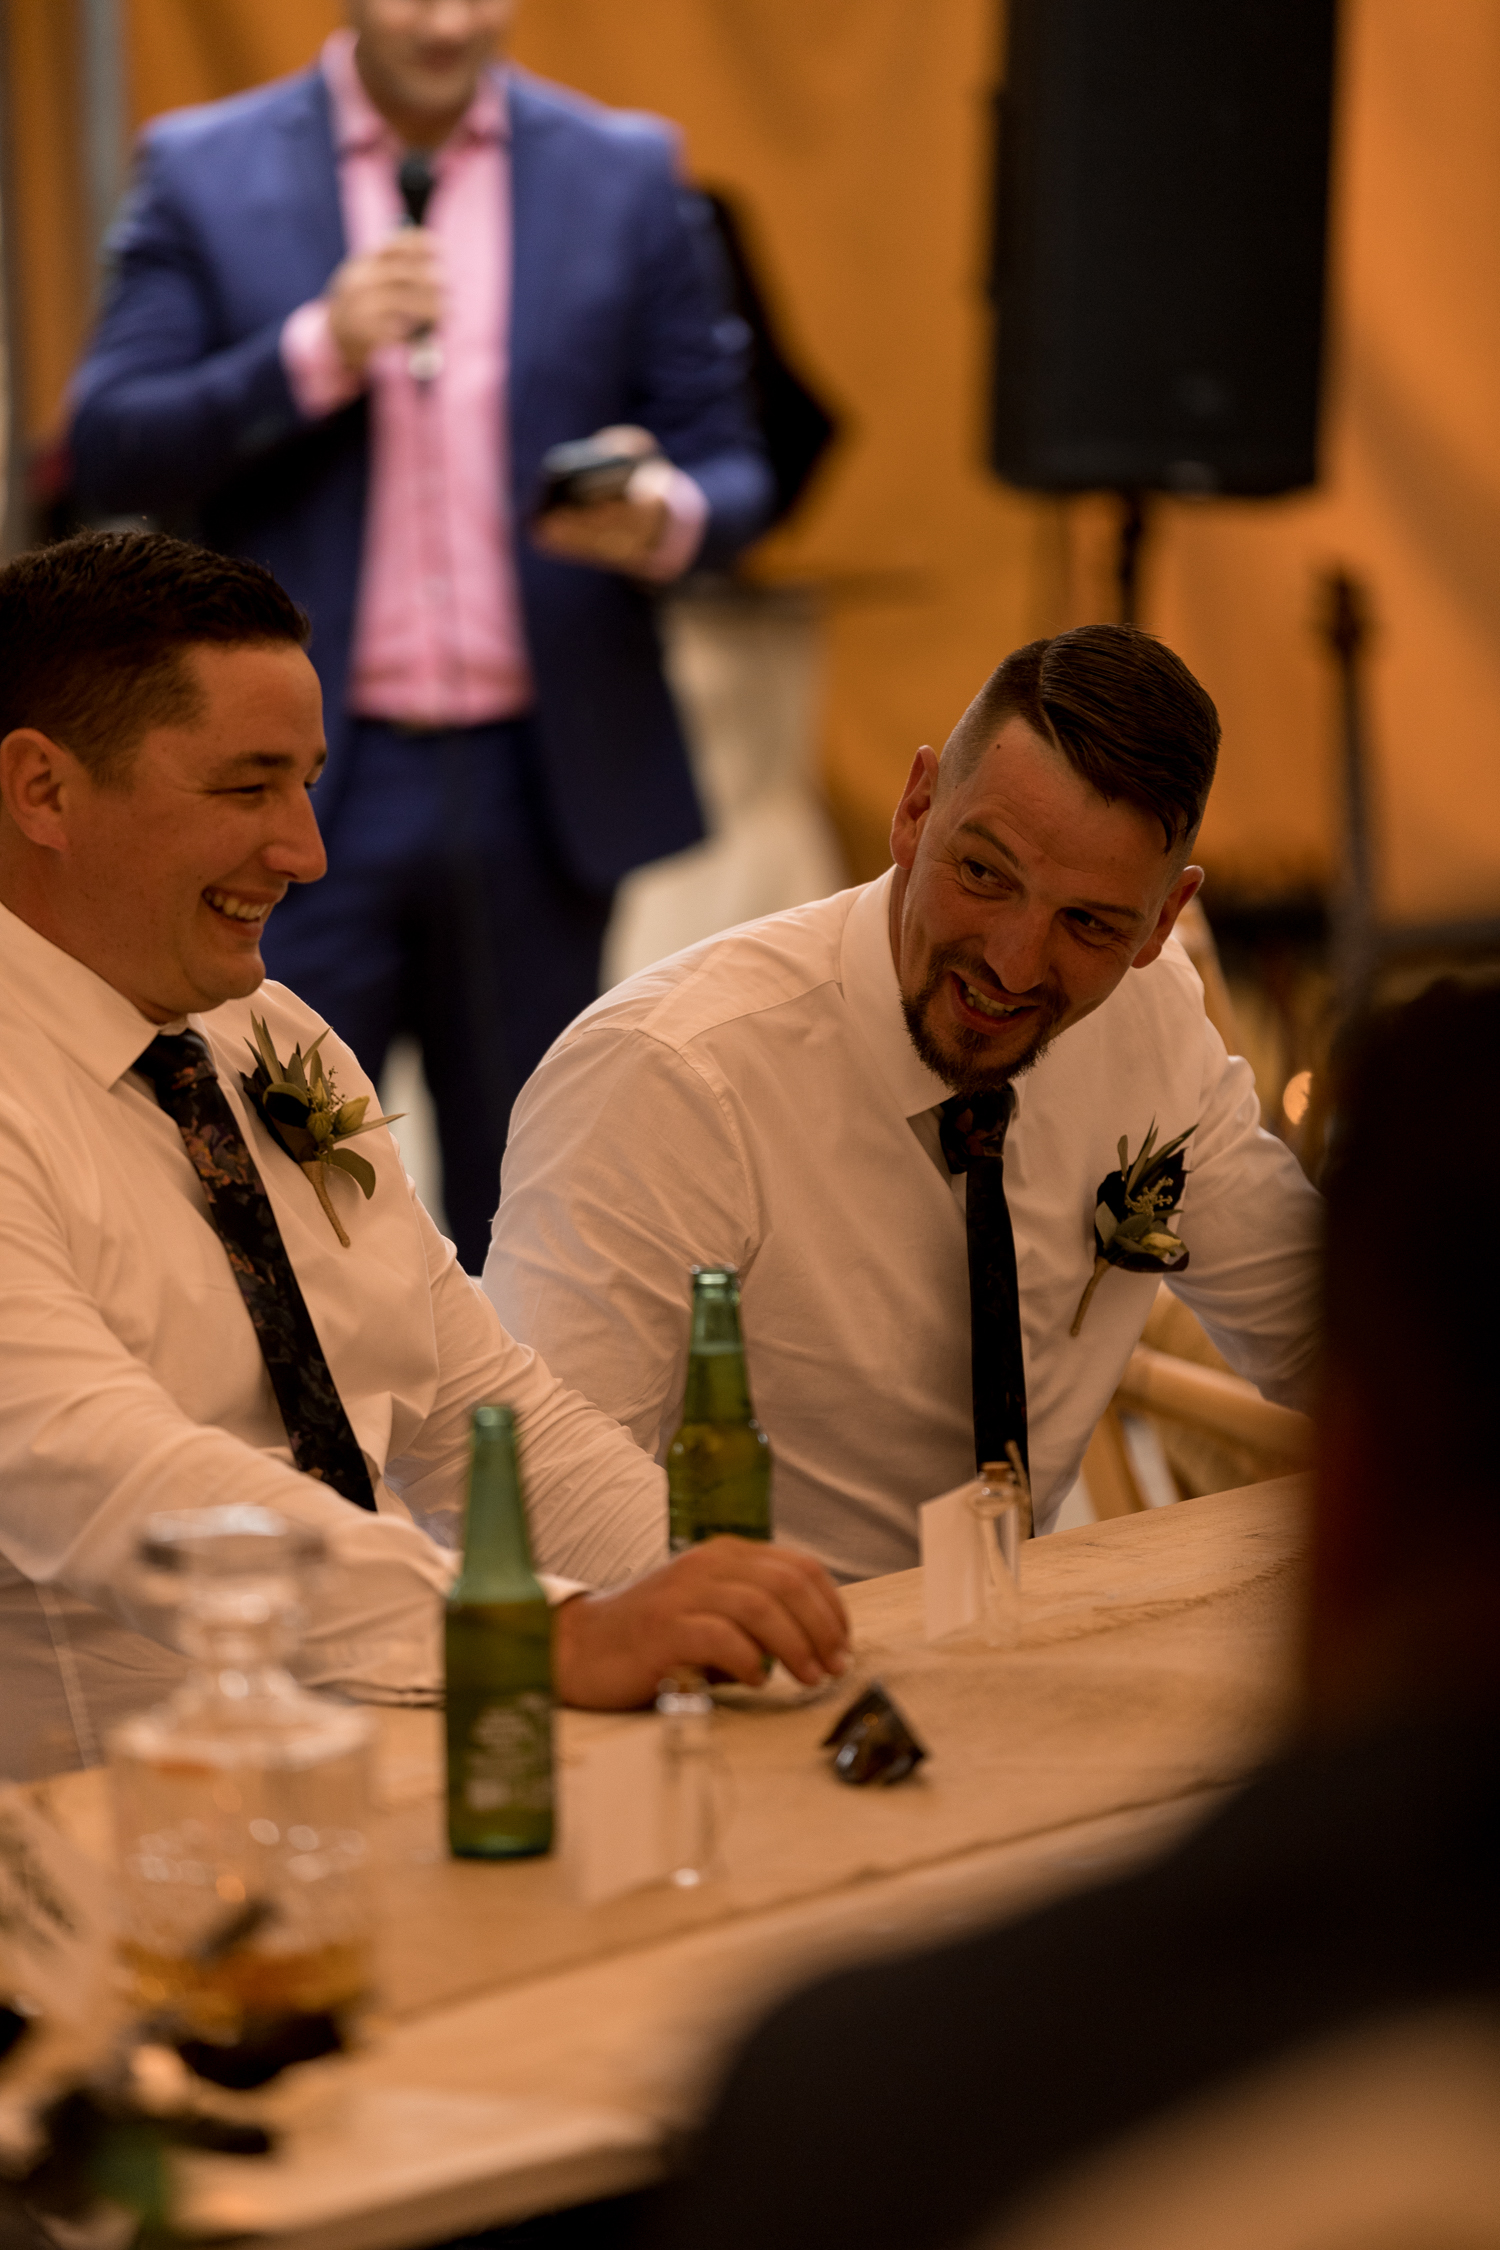 black-barn-winery-wedding-hawkes-bay-wedding-photographer-groomsmen-laughing-together-.jpg